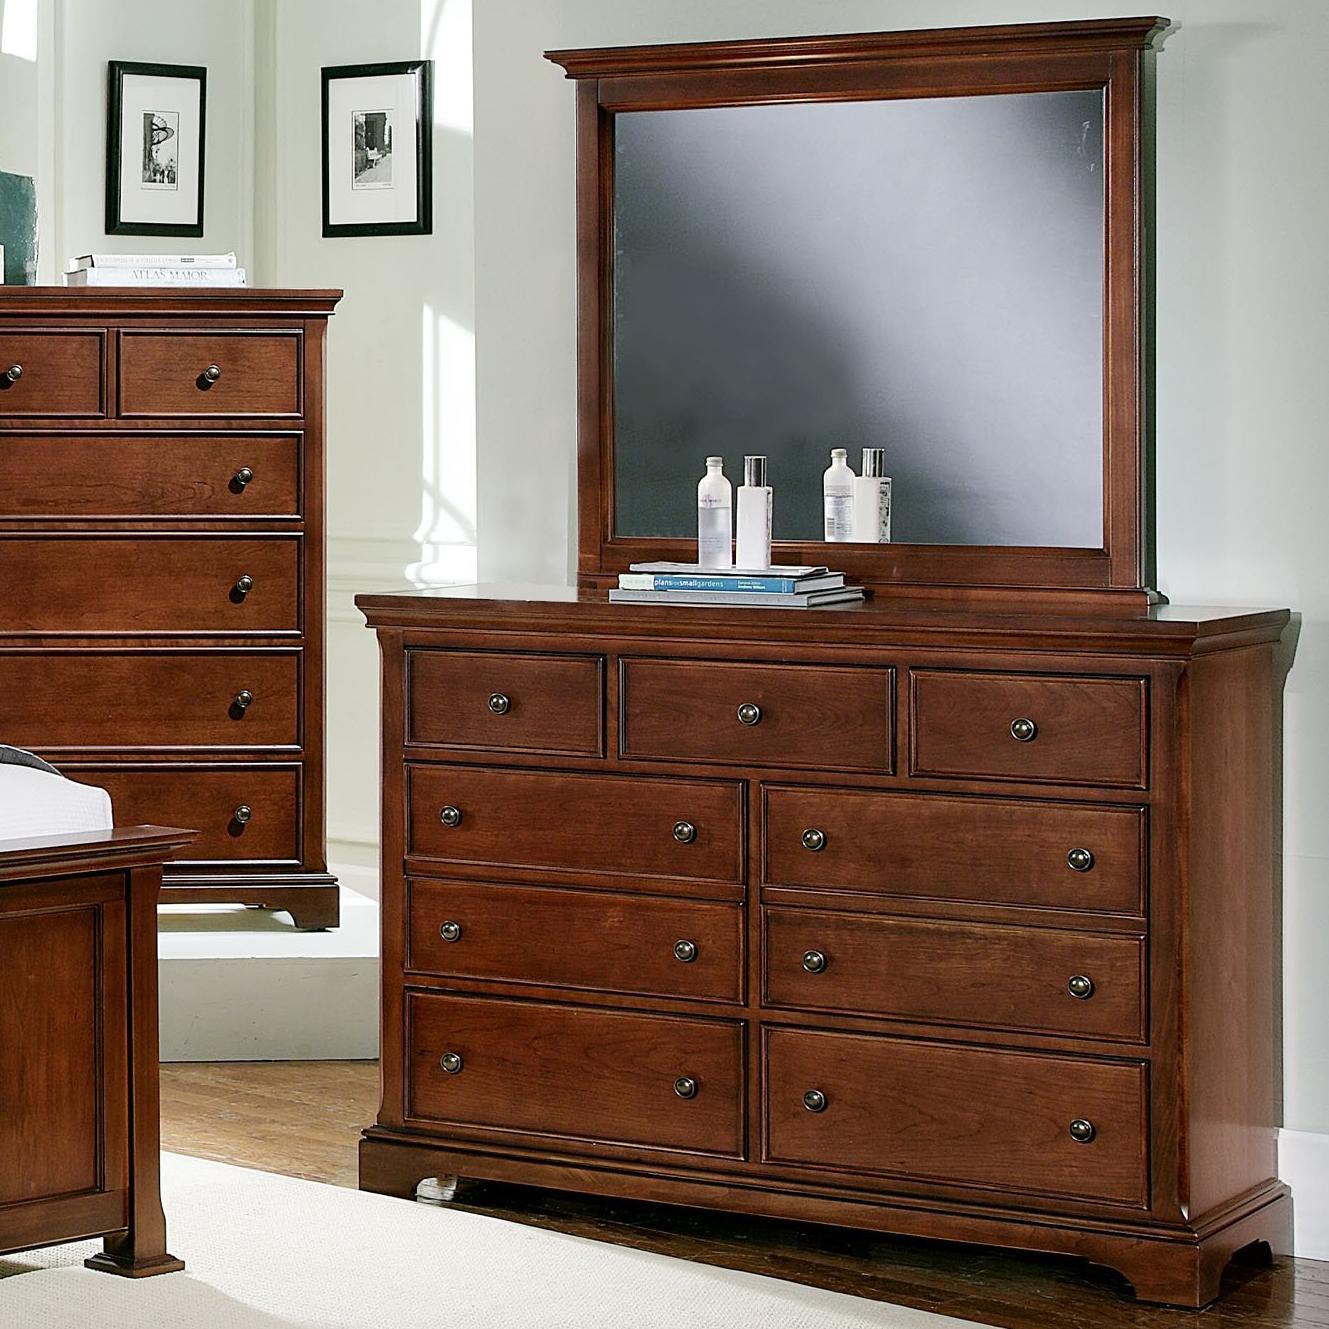 Vaughan Bassett Forsyth 7 Drawer Dresser and Mirror - Item Number: BB77-002+446